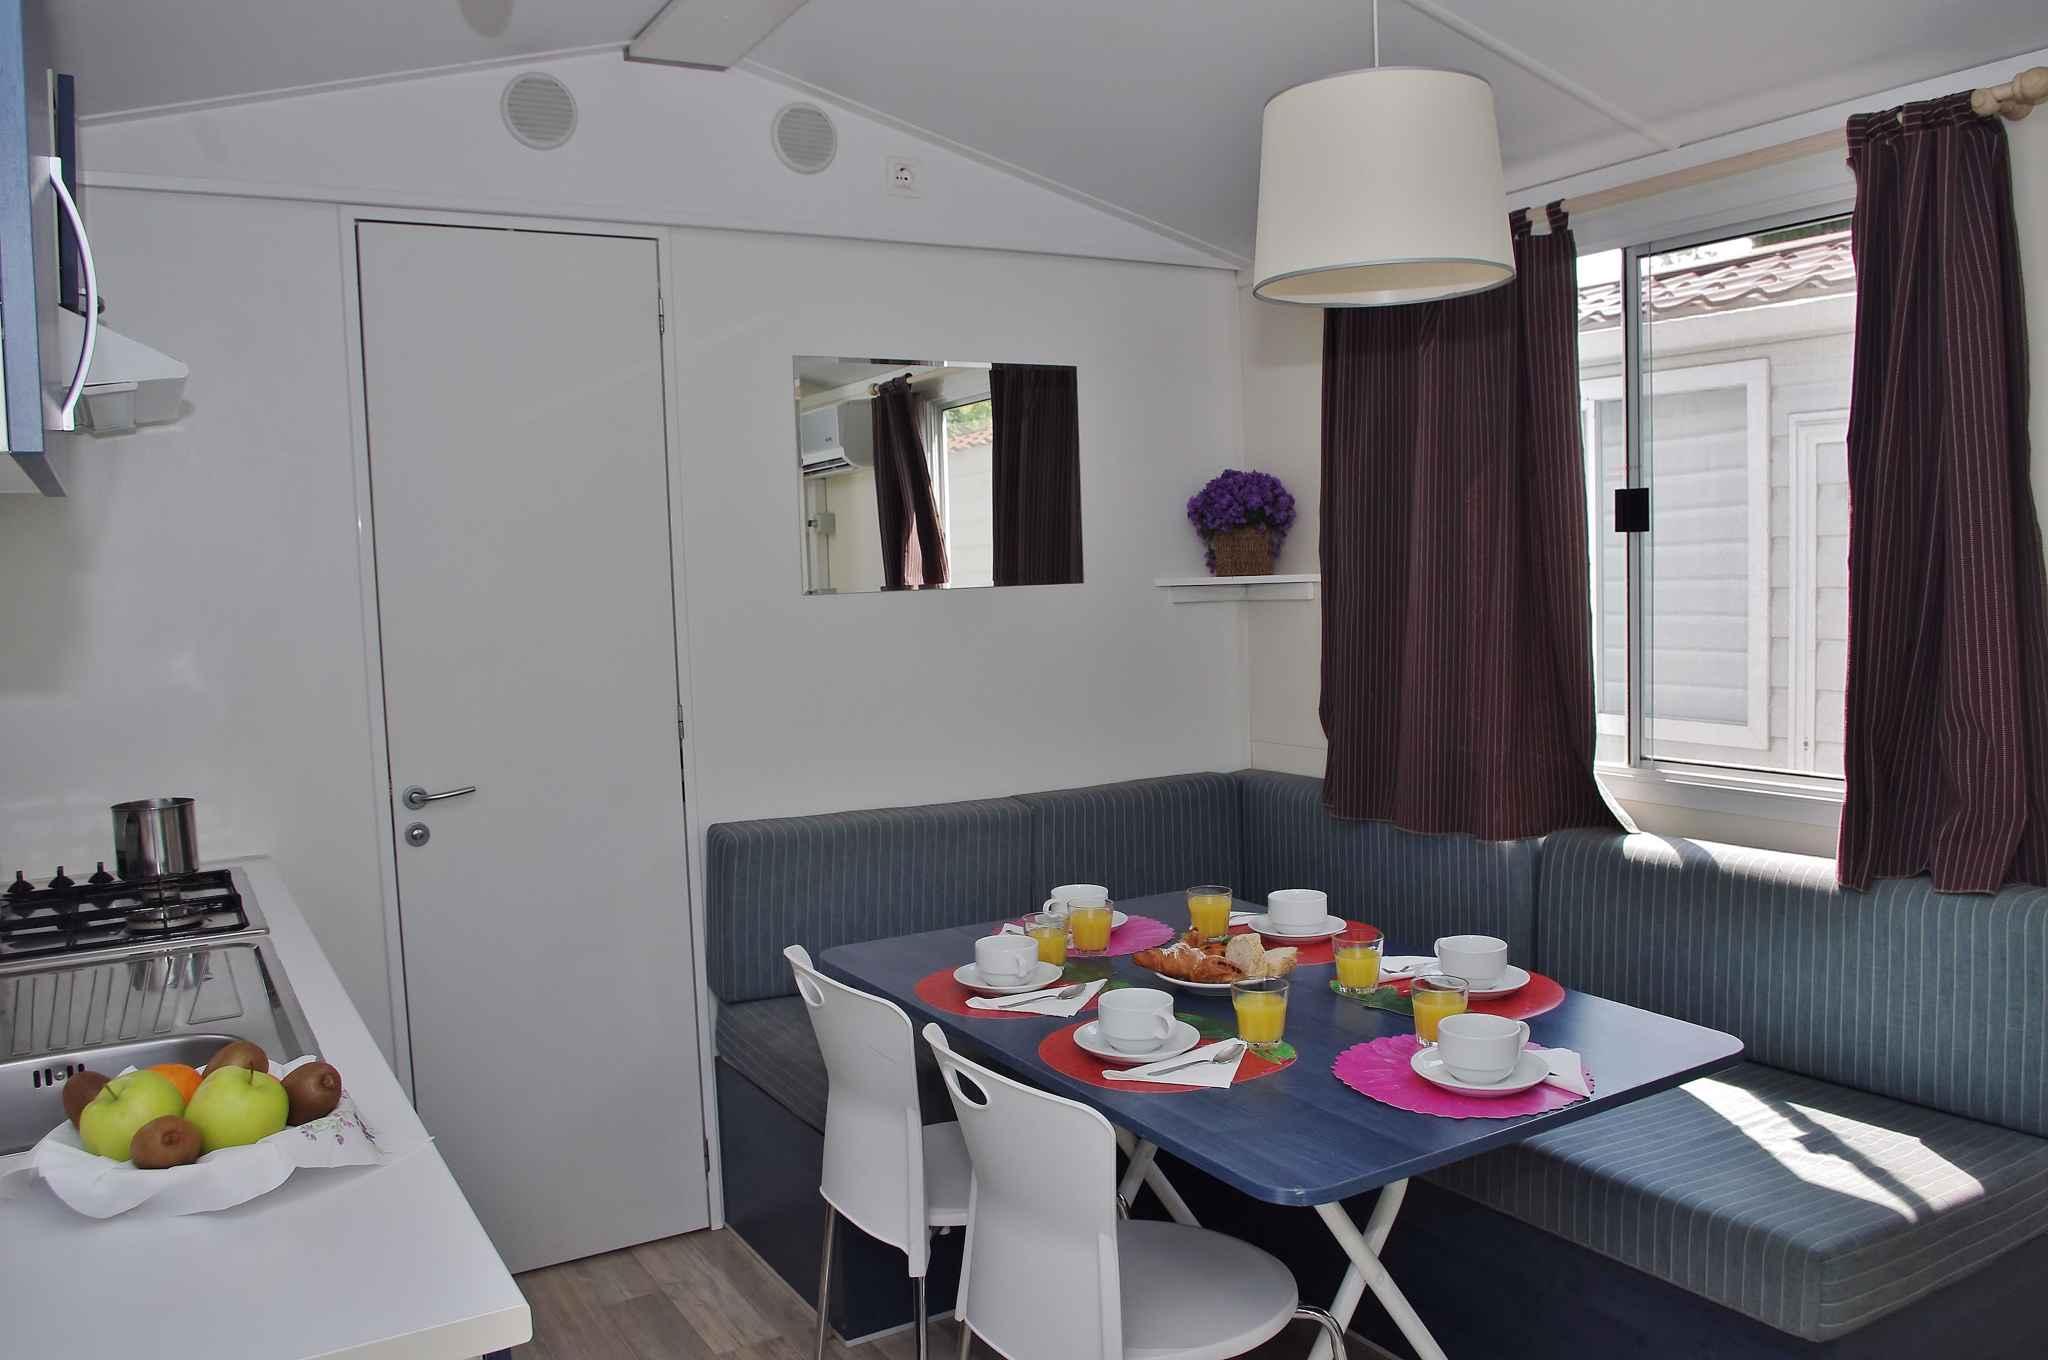 Appartement de vacances Mobilehome mit Tischtennis und Fahrradverleih (2483443), San Vito Lo Capo, Trapani, Sicile, Italie, image 11